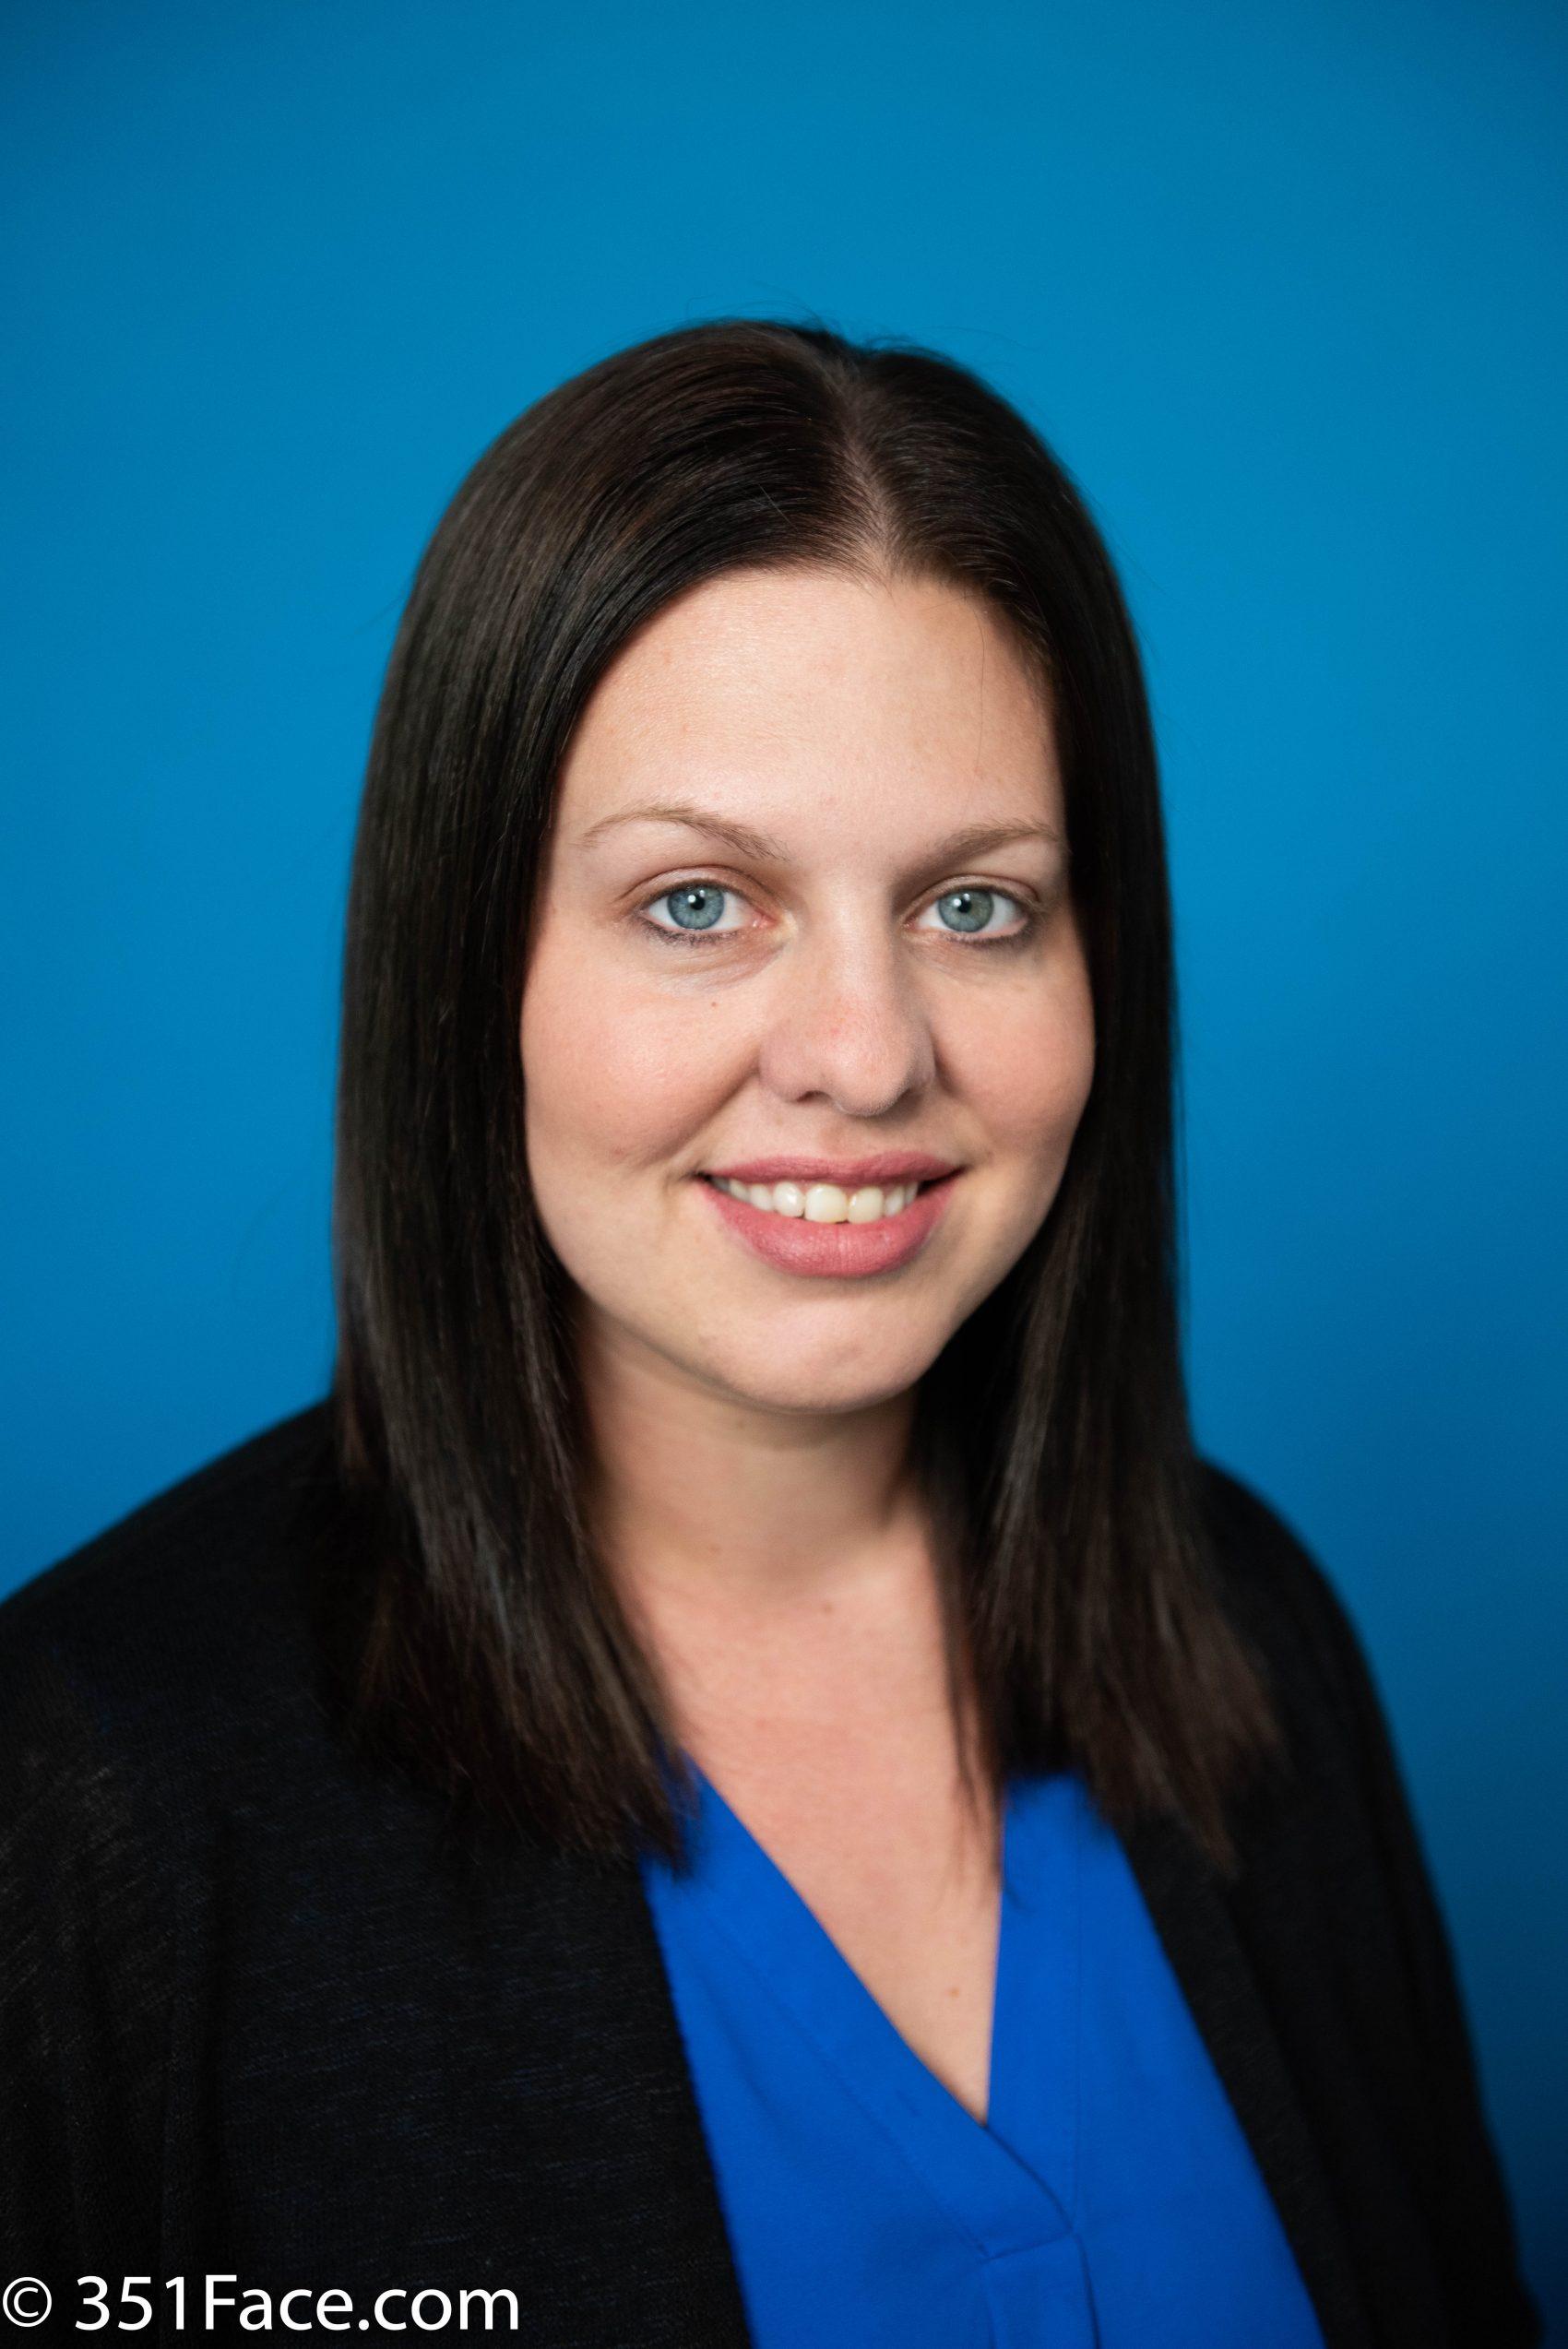 Kristin Stoecker